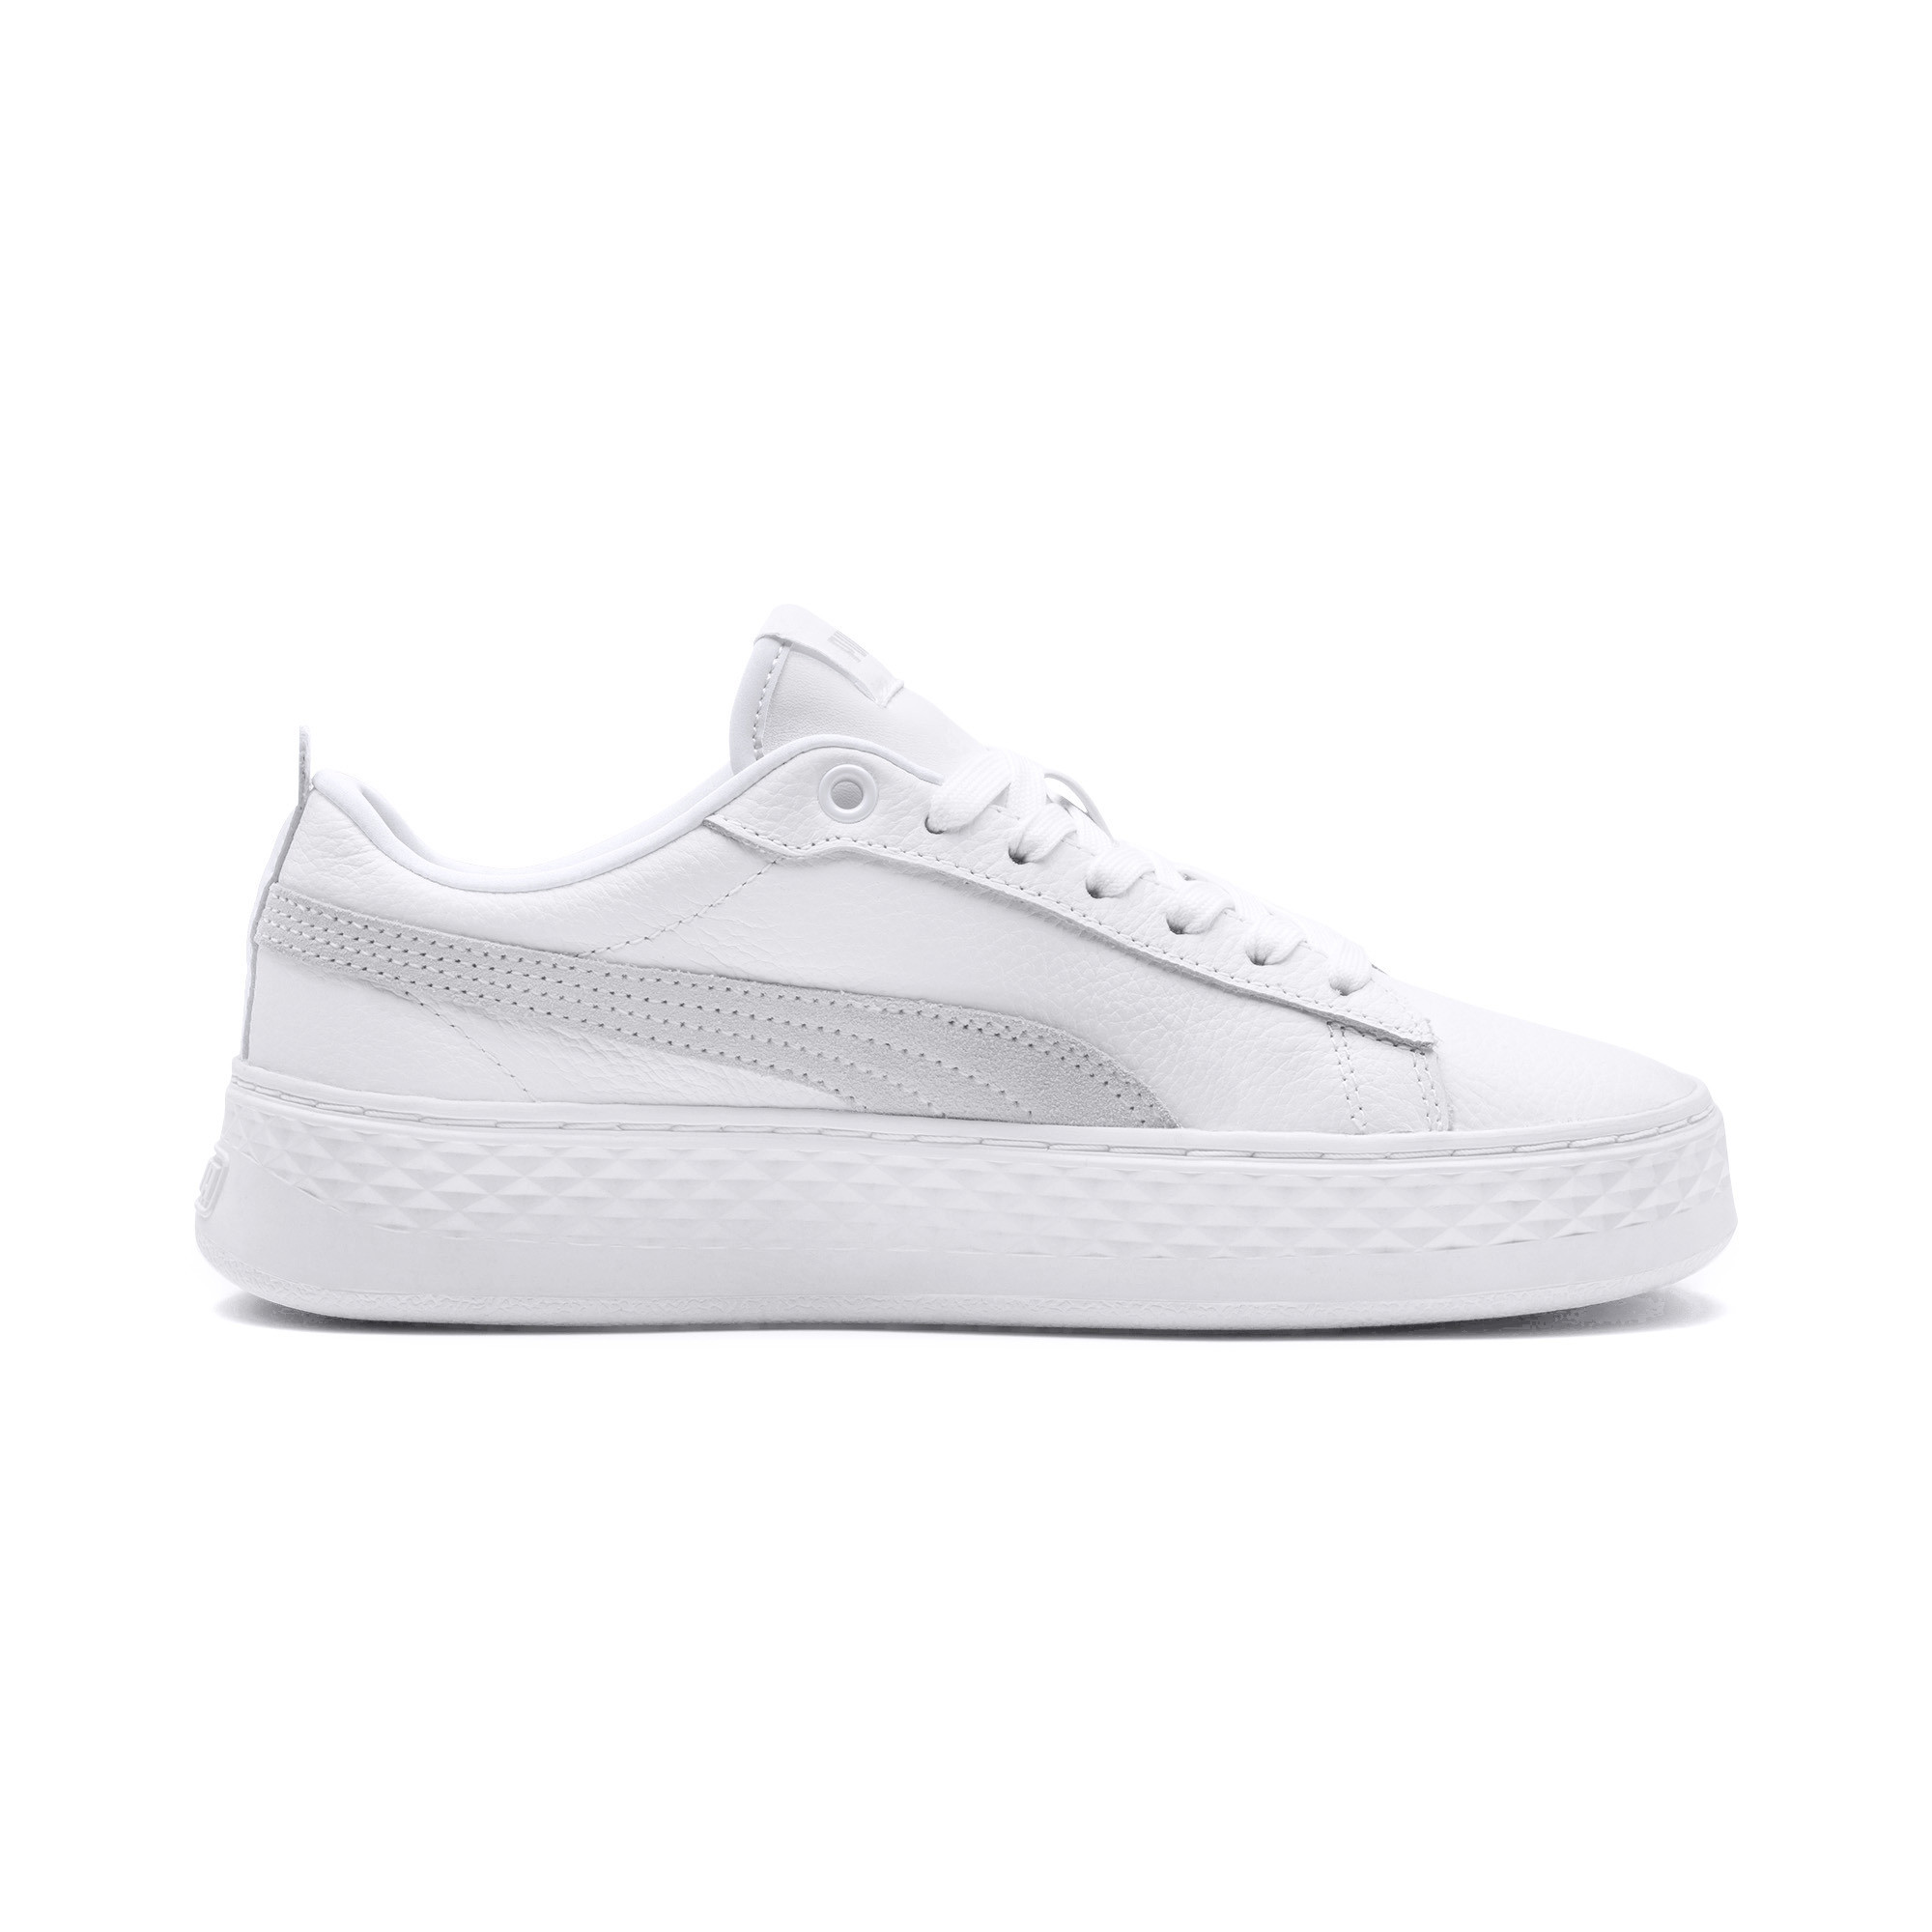 PUMA-Smash-Platform-Leather-Women-039-s-Sneakers-Women-Shoe-Basics thumbnail 6